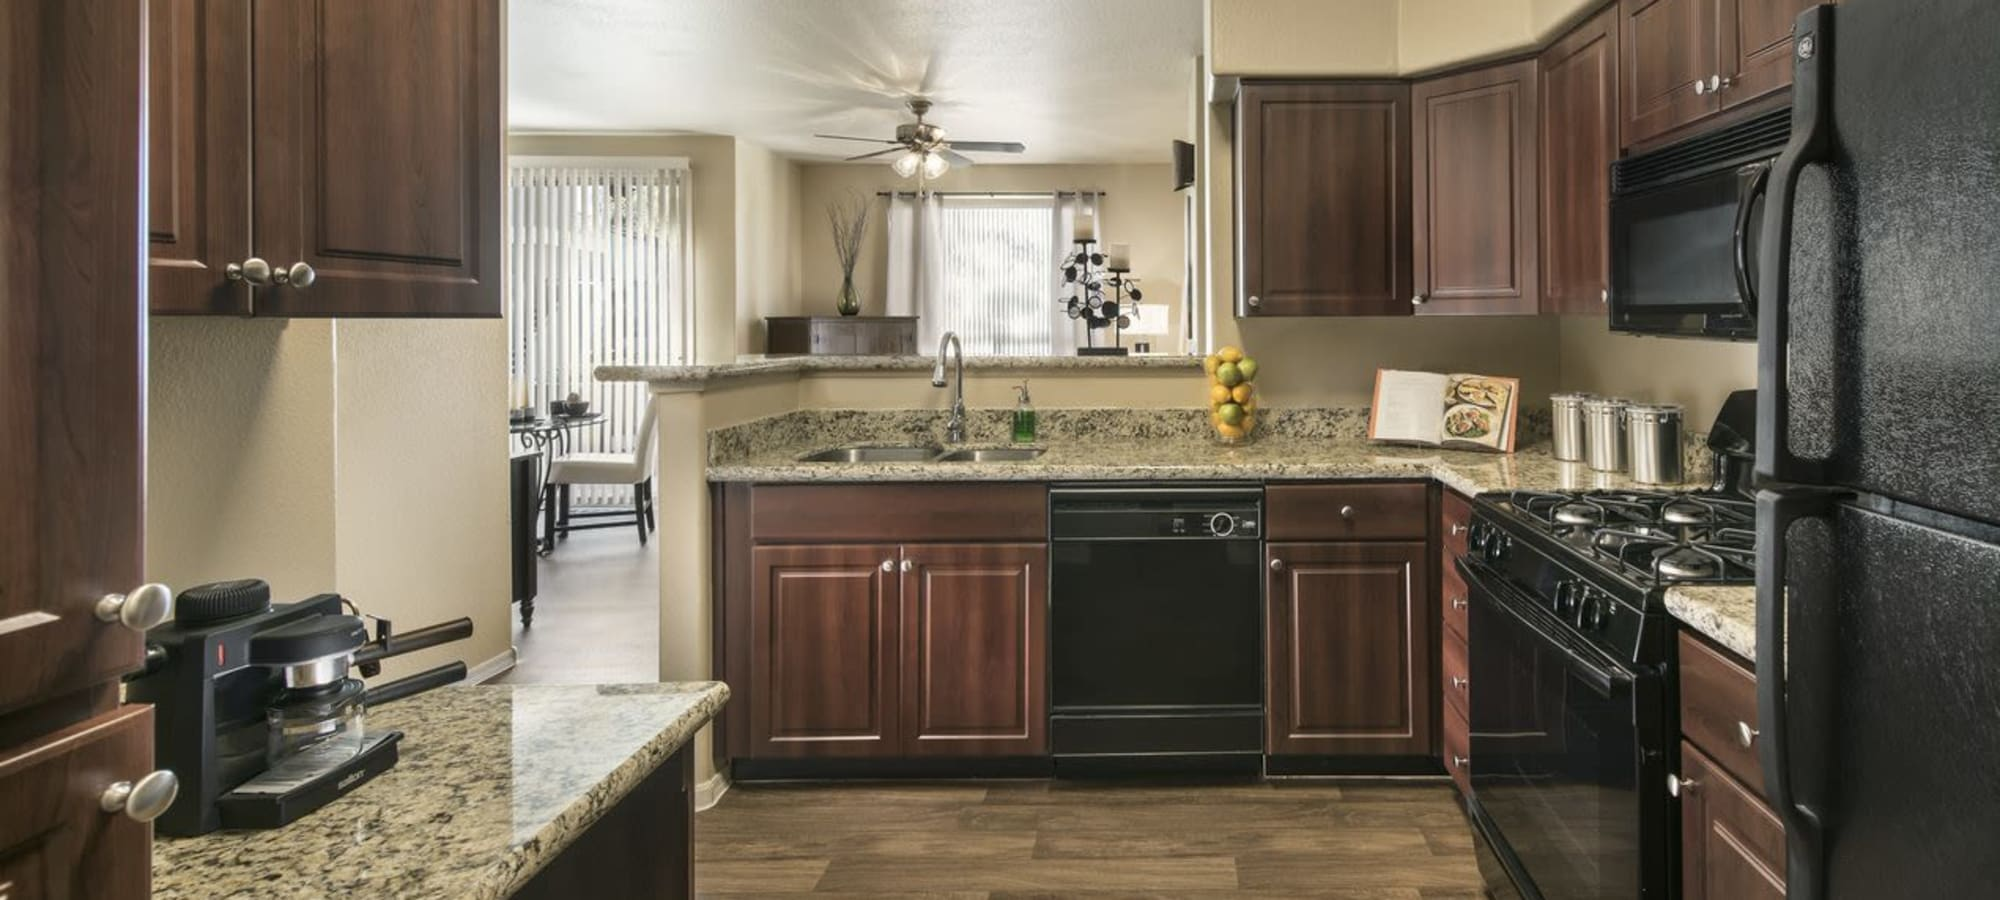 Beautiful brown kitchen at Laguna at Arrowhead Ranch in Glendale, Arizona